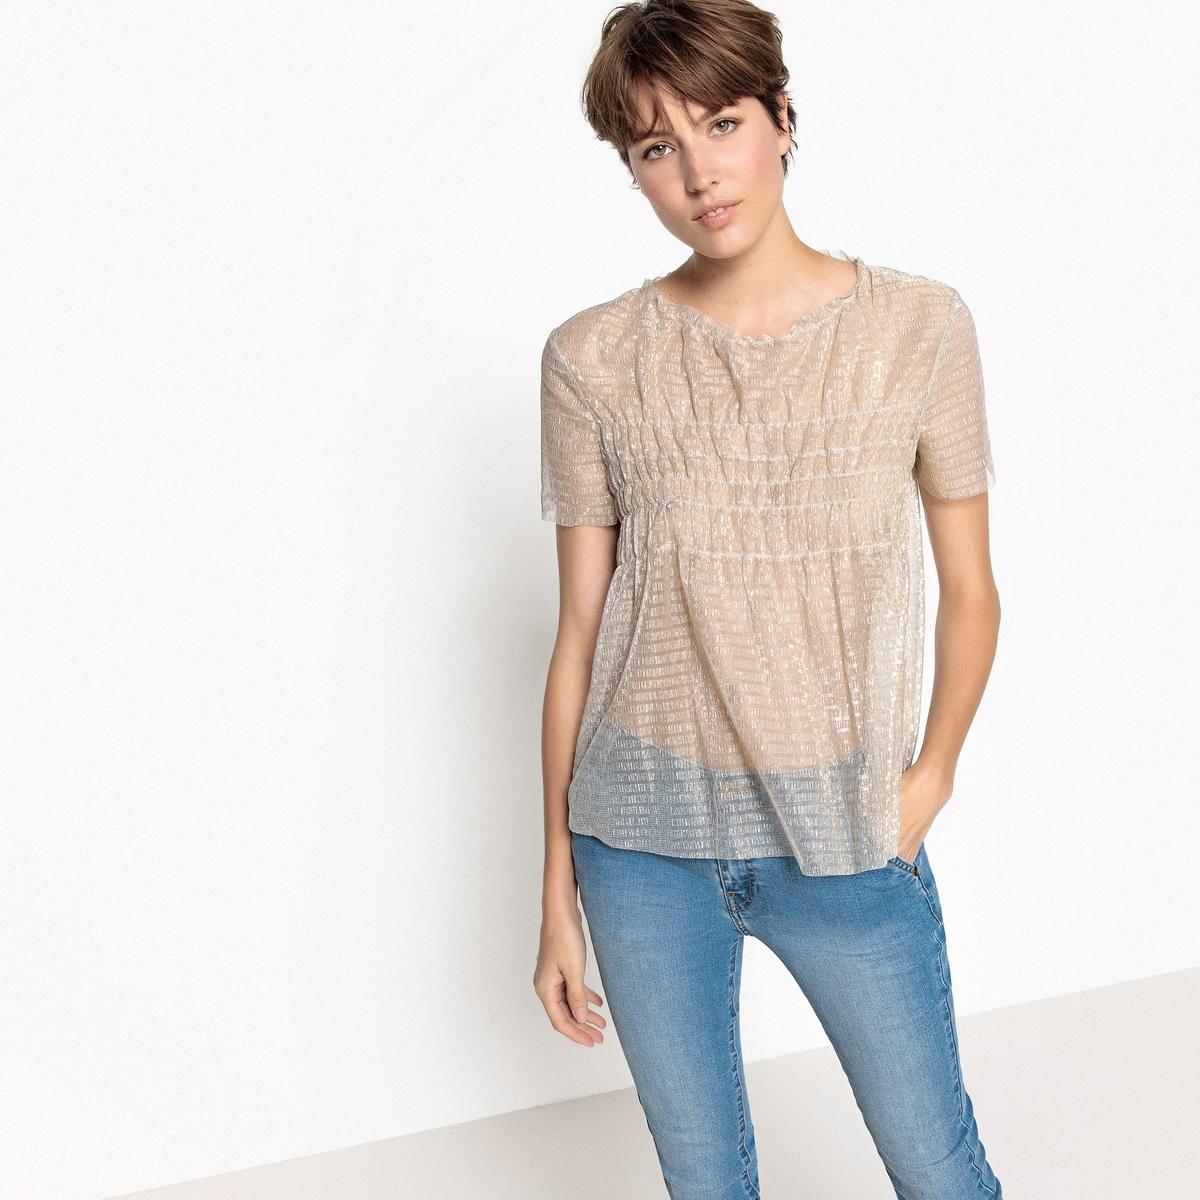 Блузка из блестящей вуали с короткими рукавами